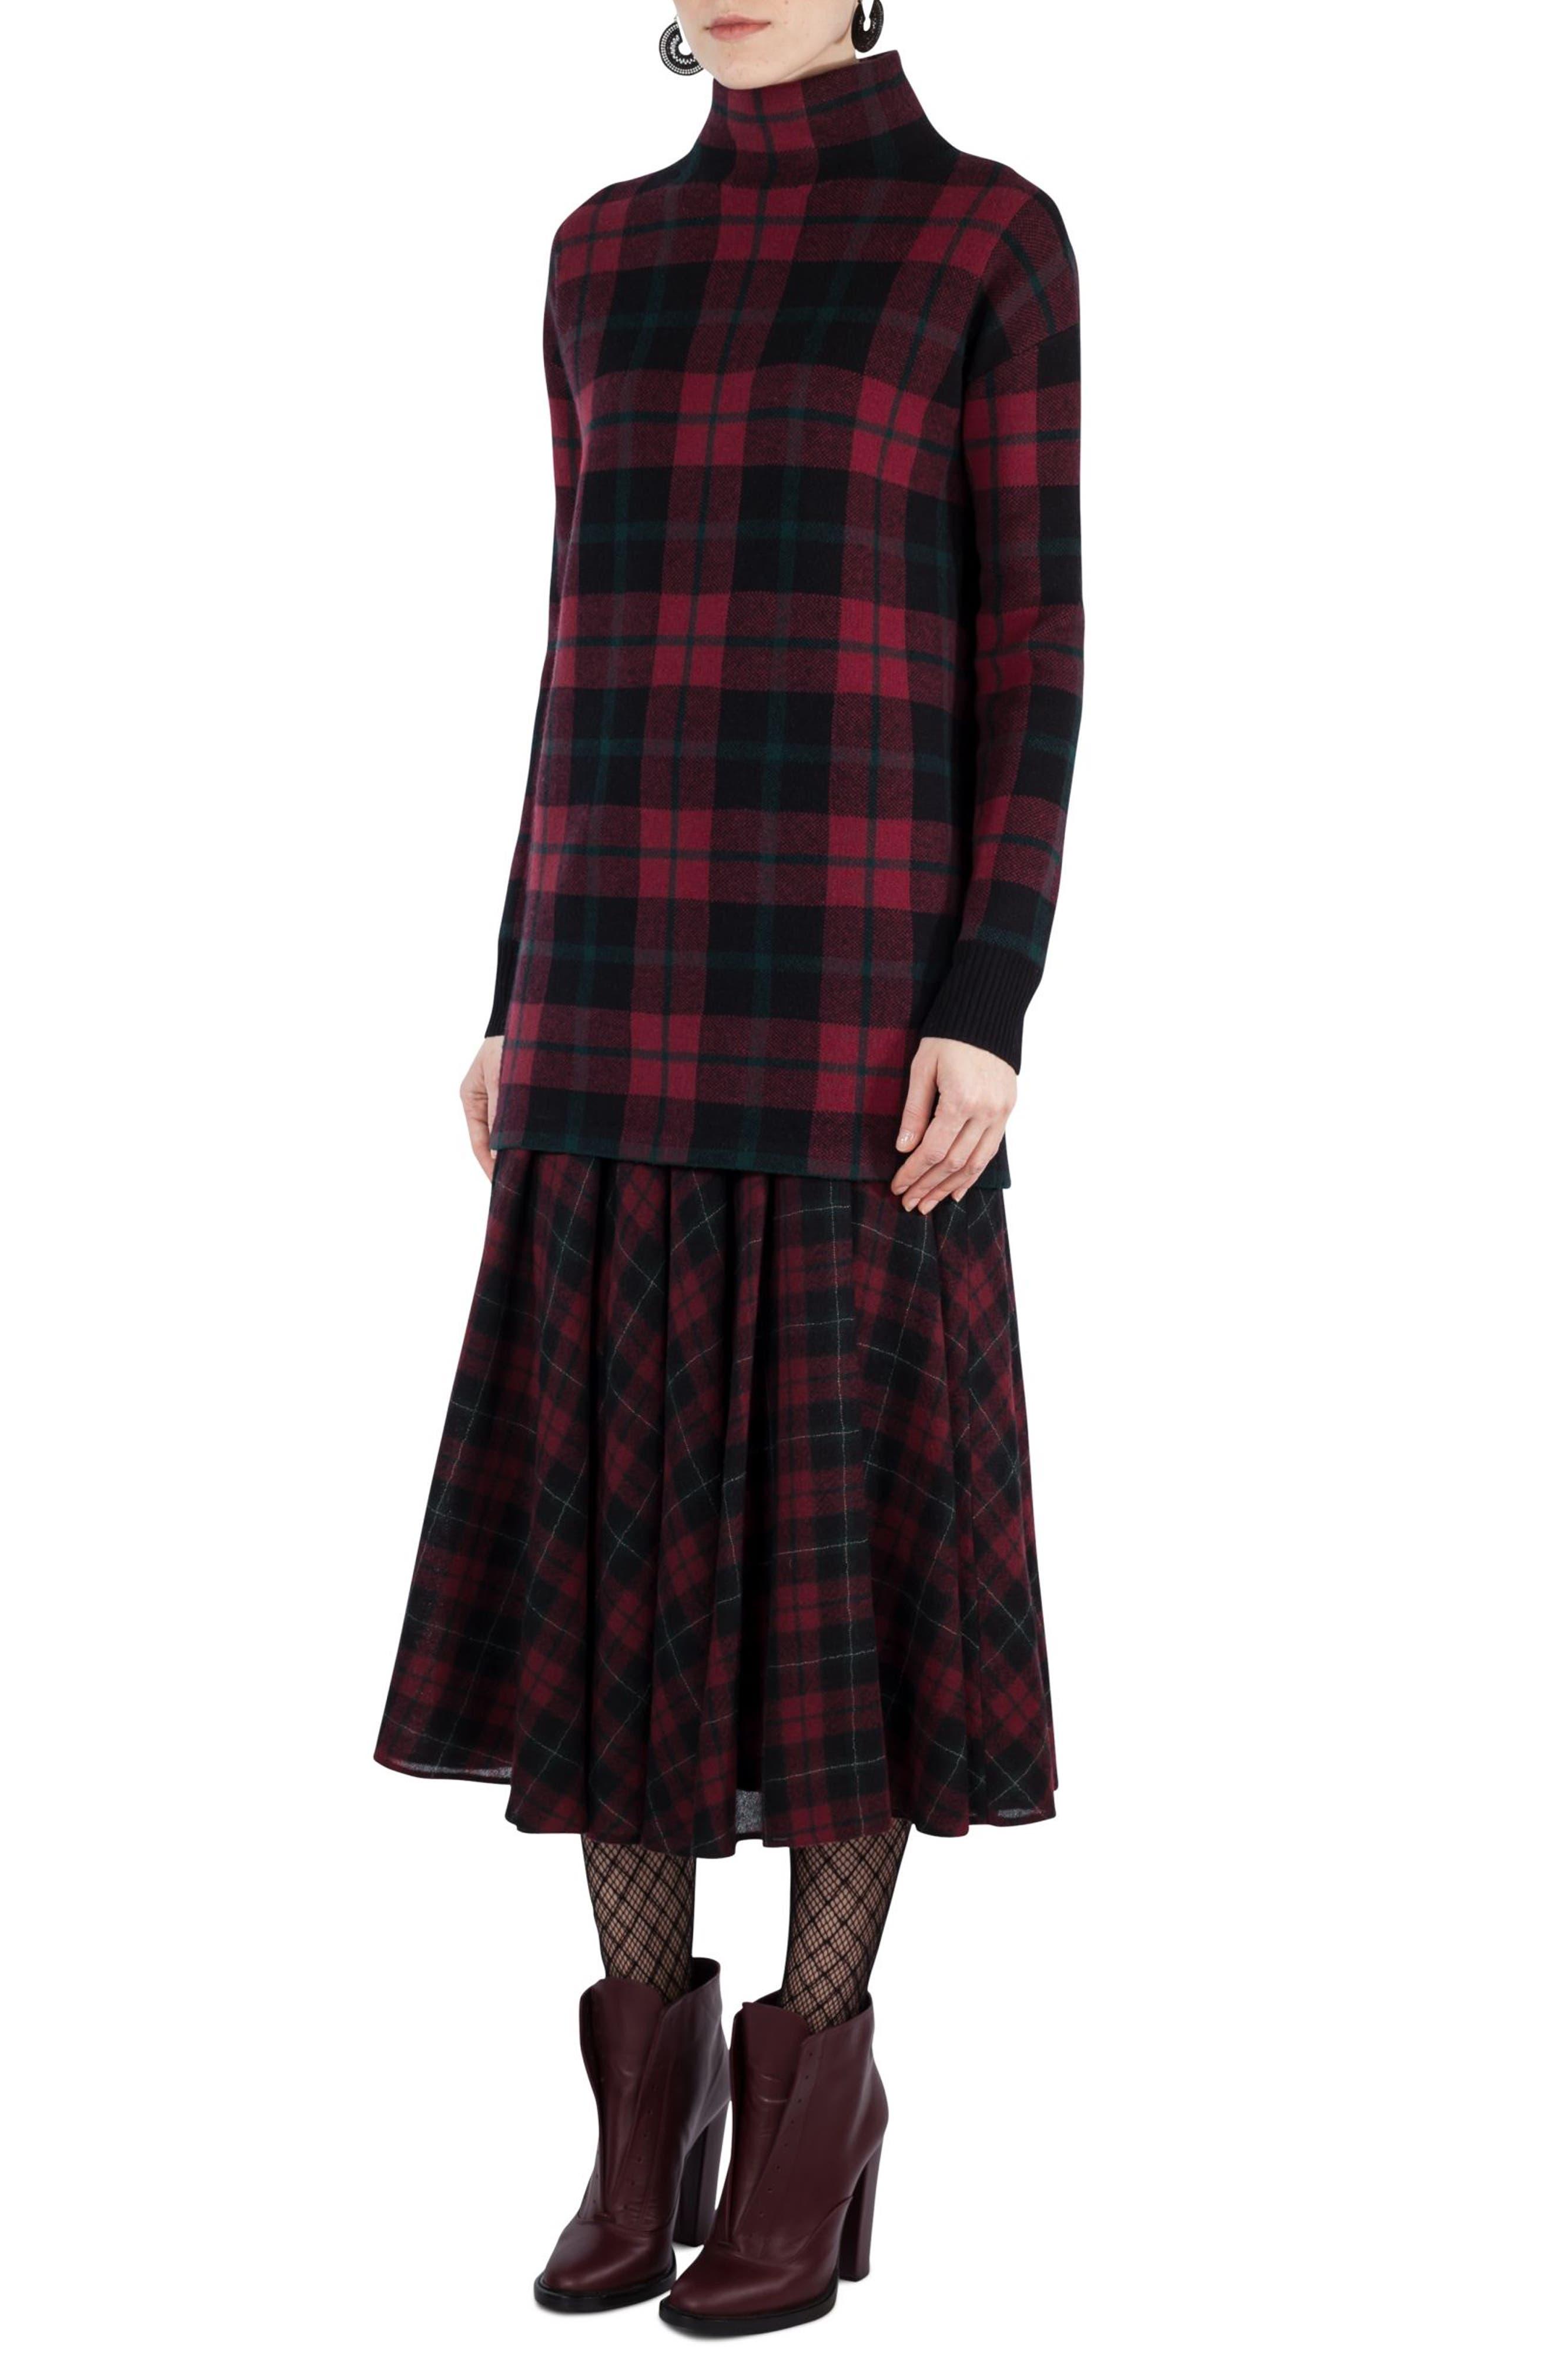 AKRIS PUNTO Plaid Wool & Cashmere Tunic Pullover